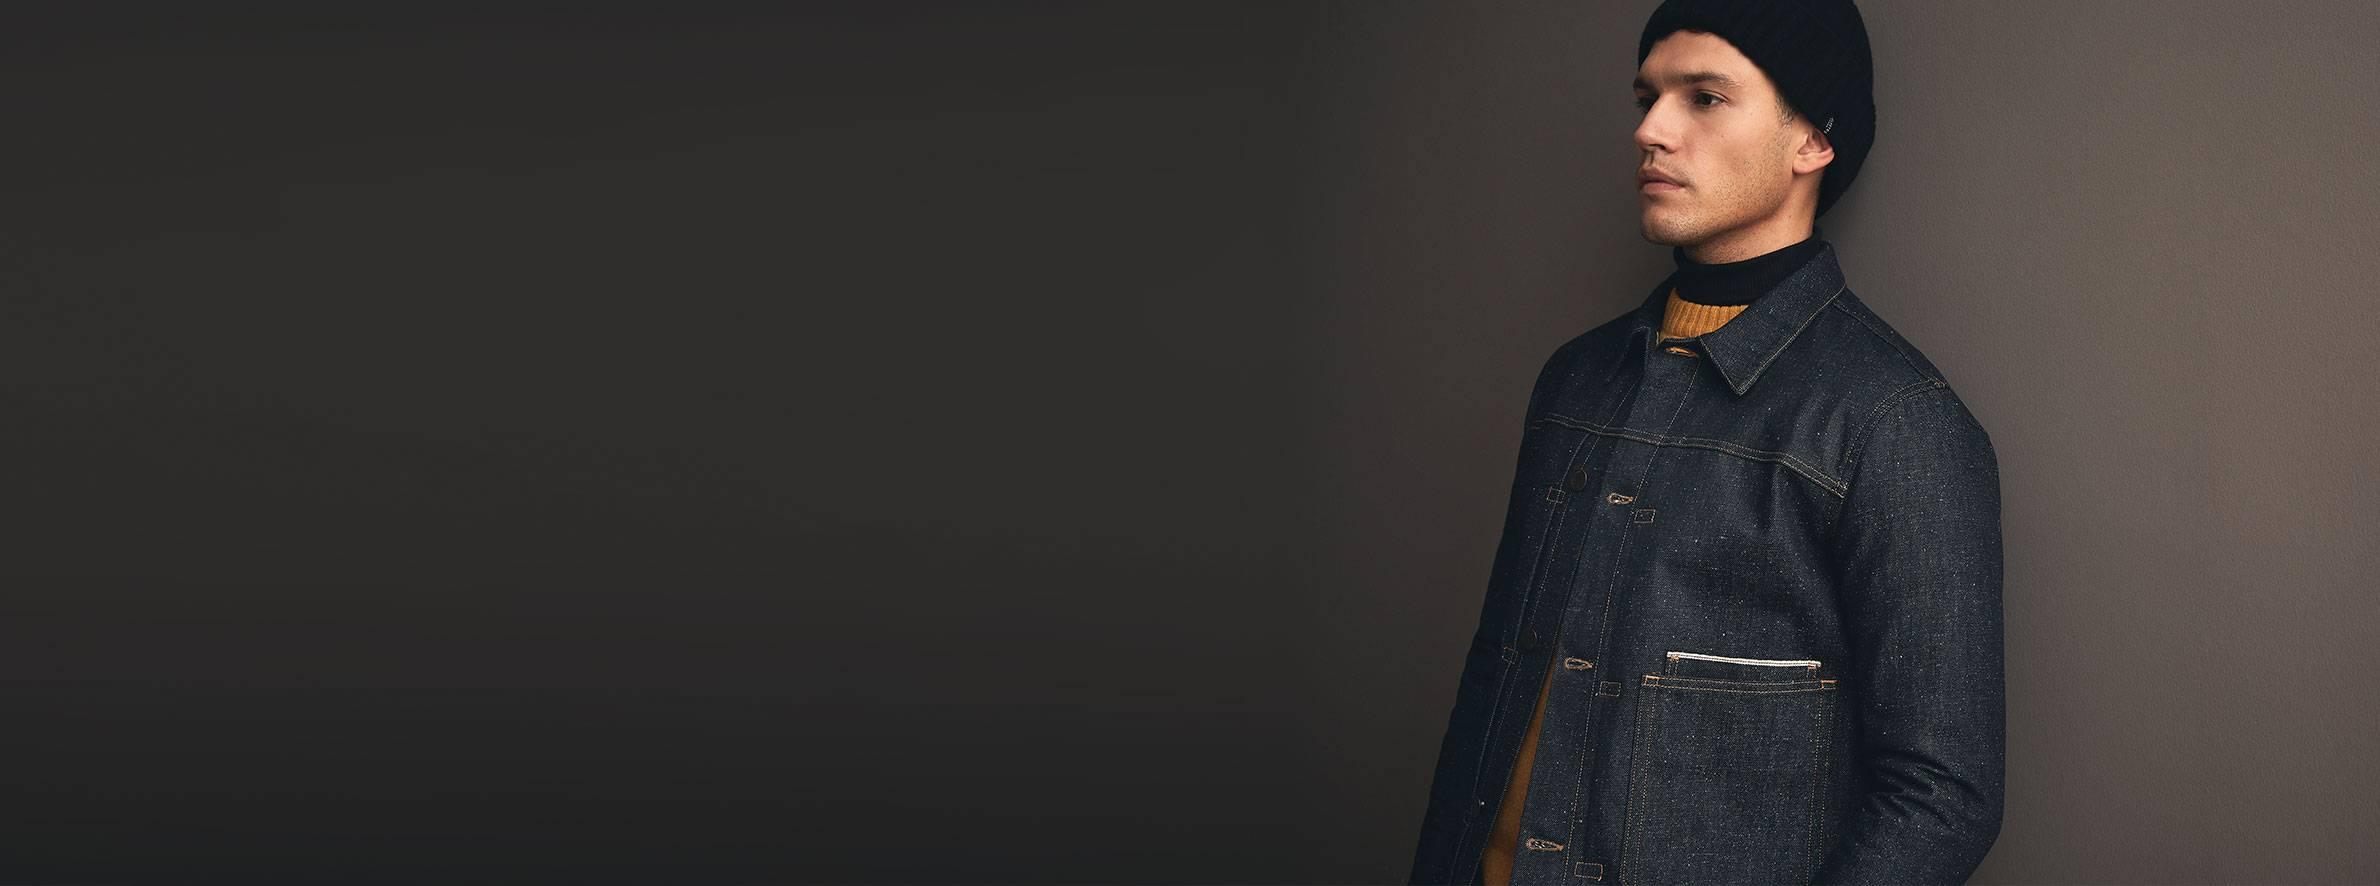 Coats & Jackets · Shirts